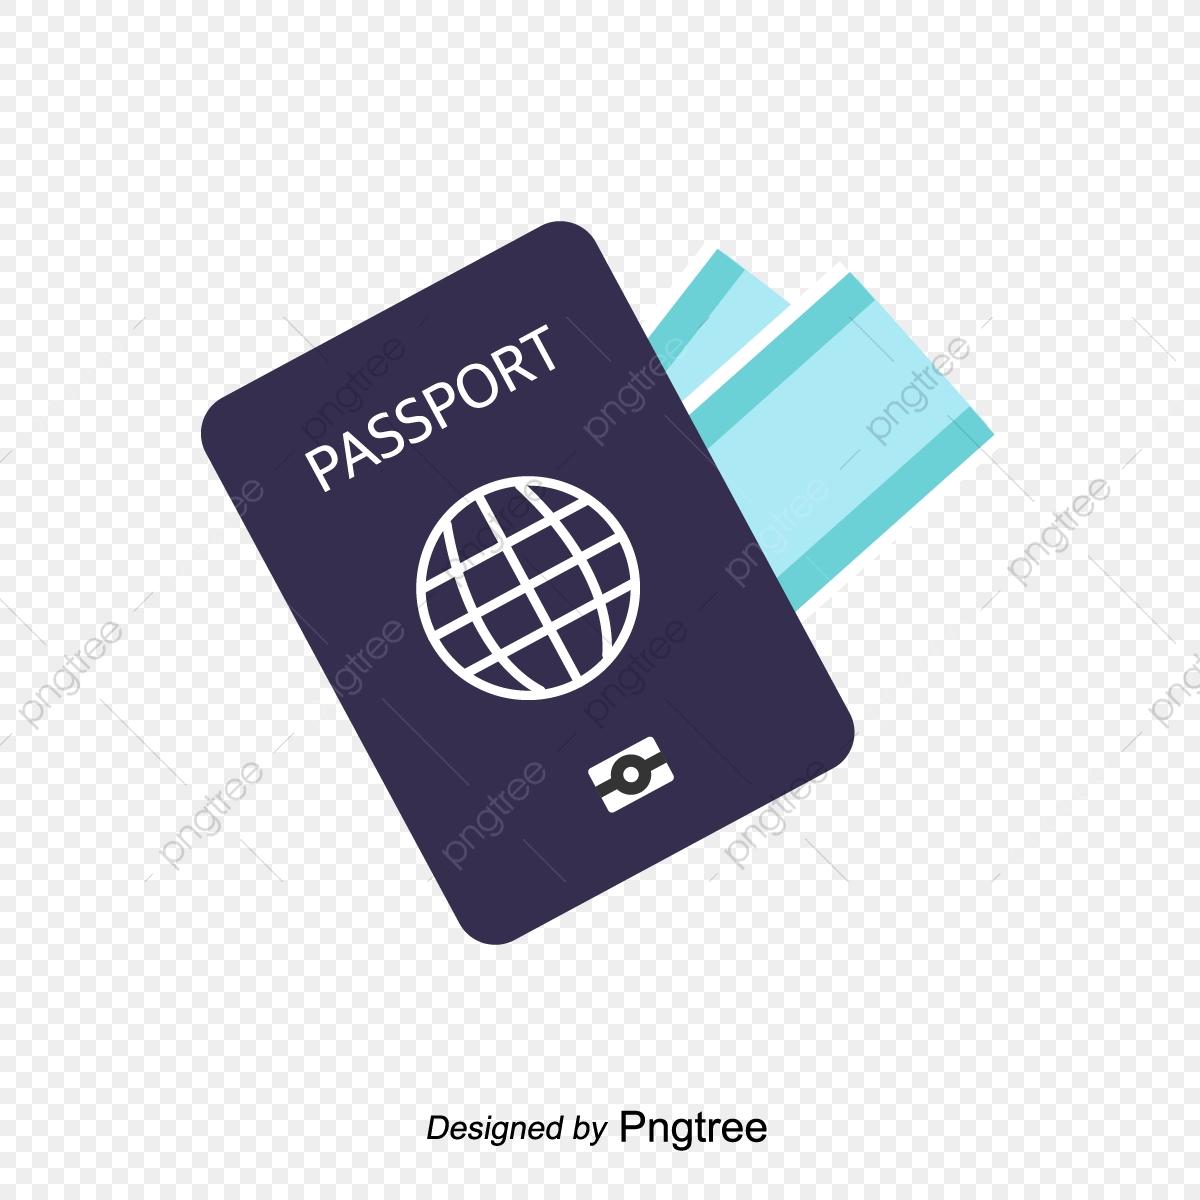 Blue visa ticket element. Passport clipart transparent background passport